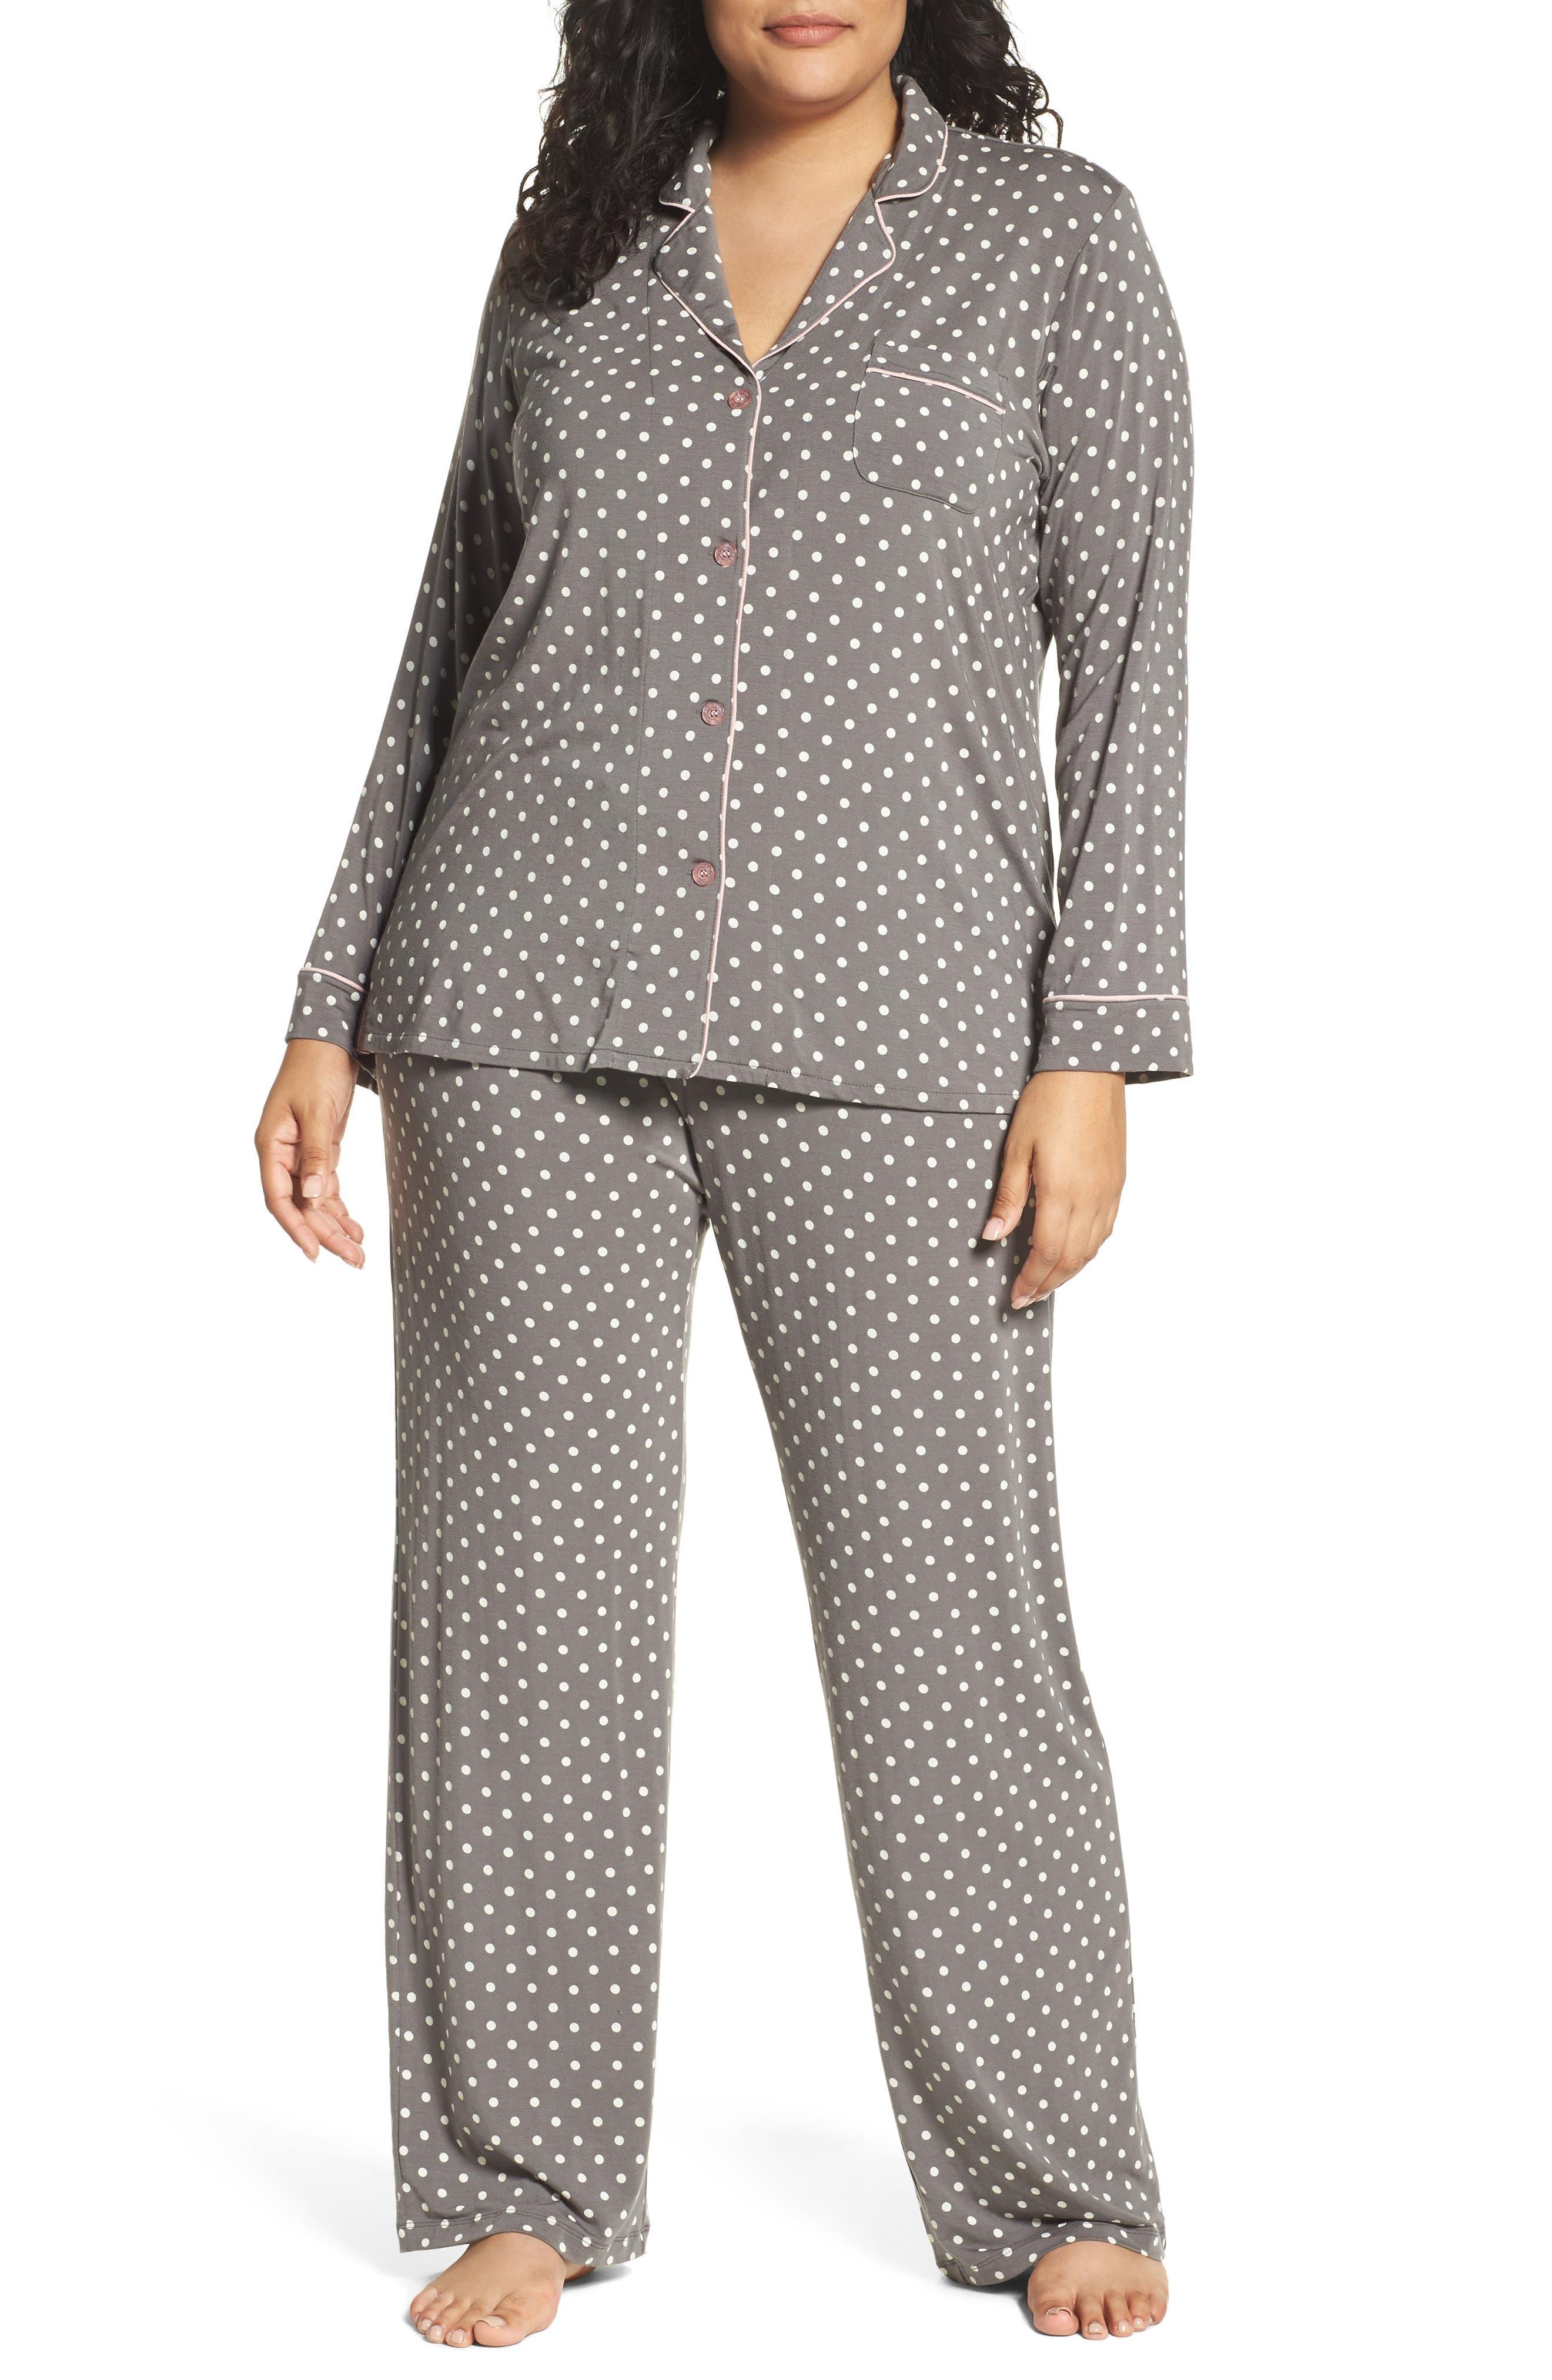 Polka Dot Pajamas,                         Main,                         color, Charcoal